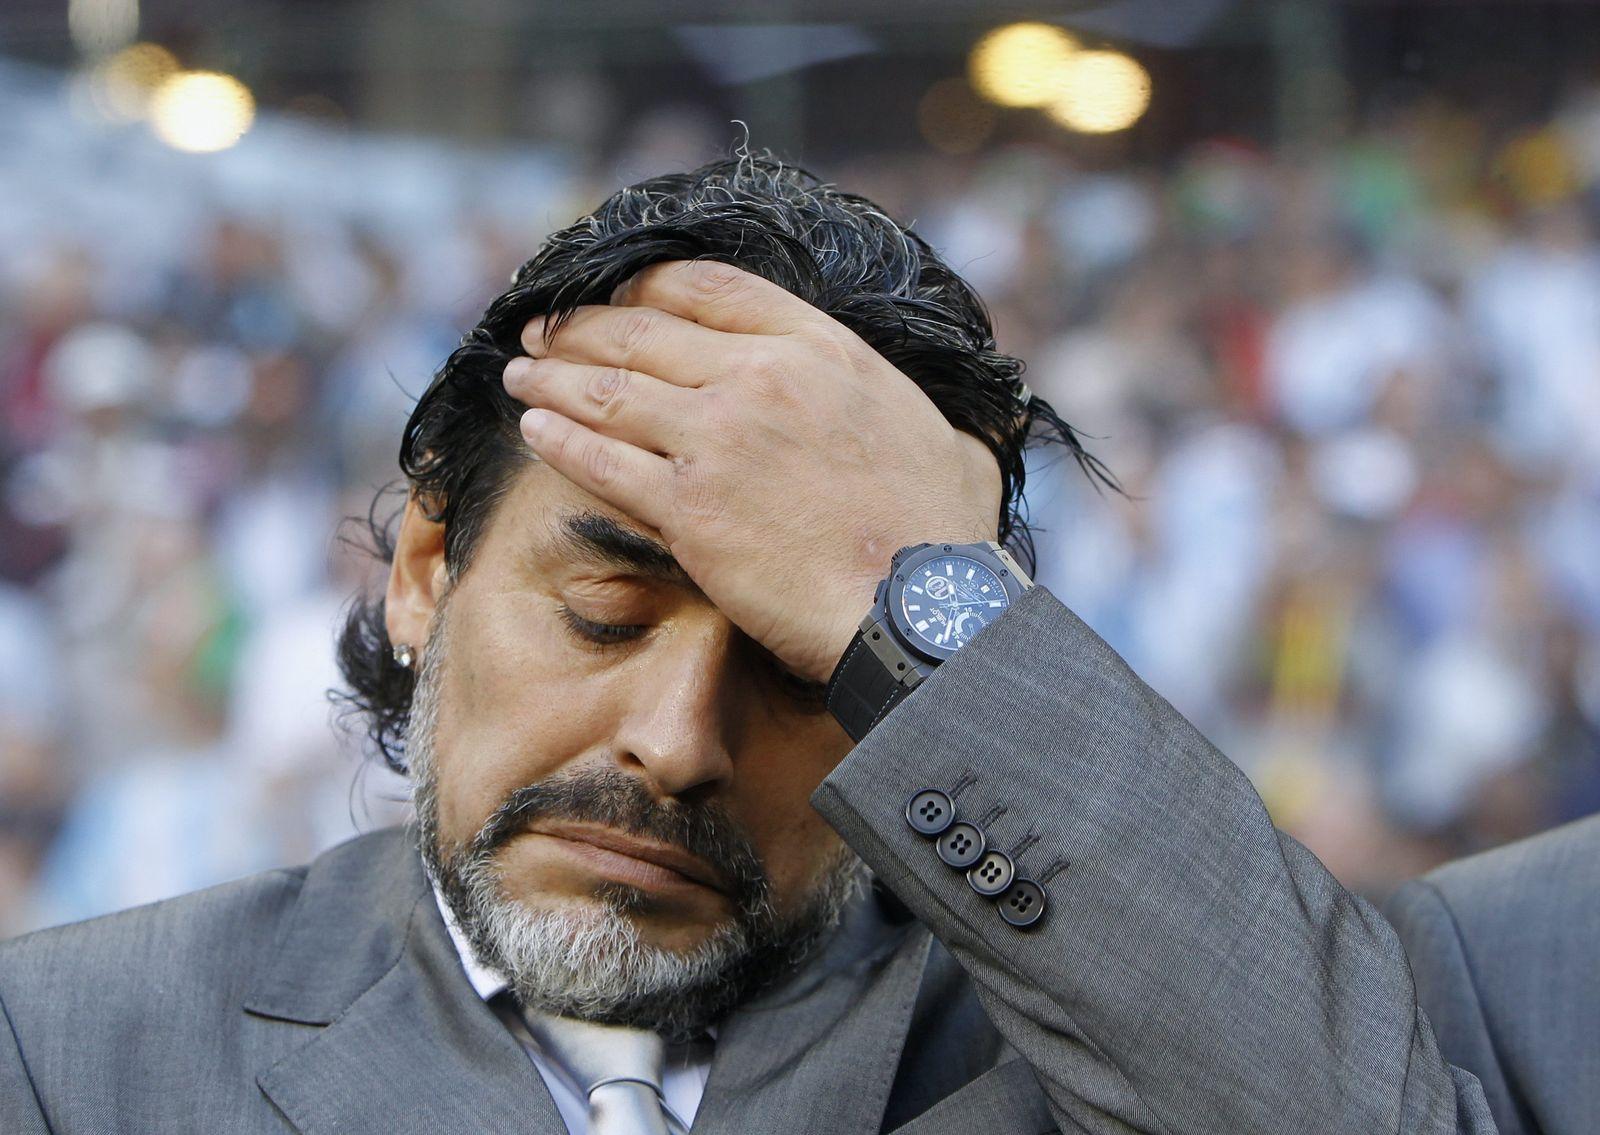 Maradona fassungslos